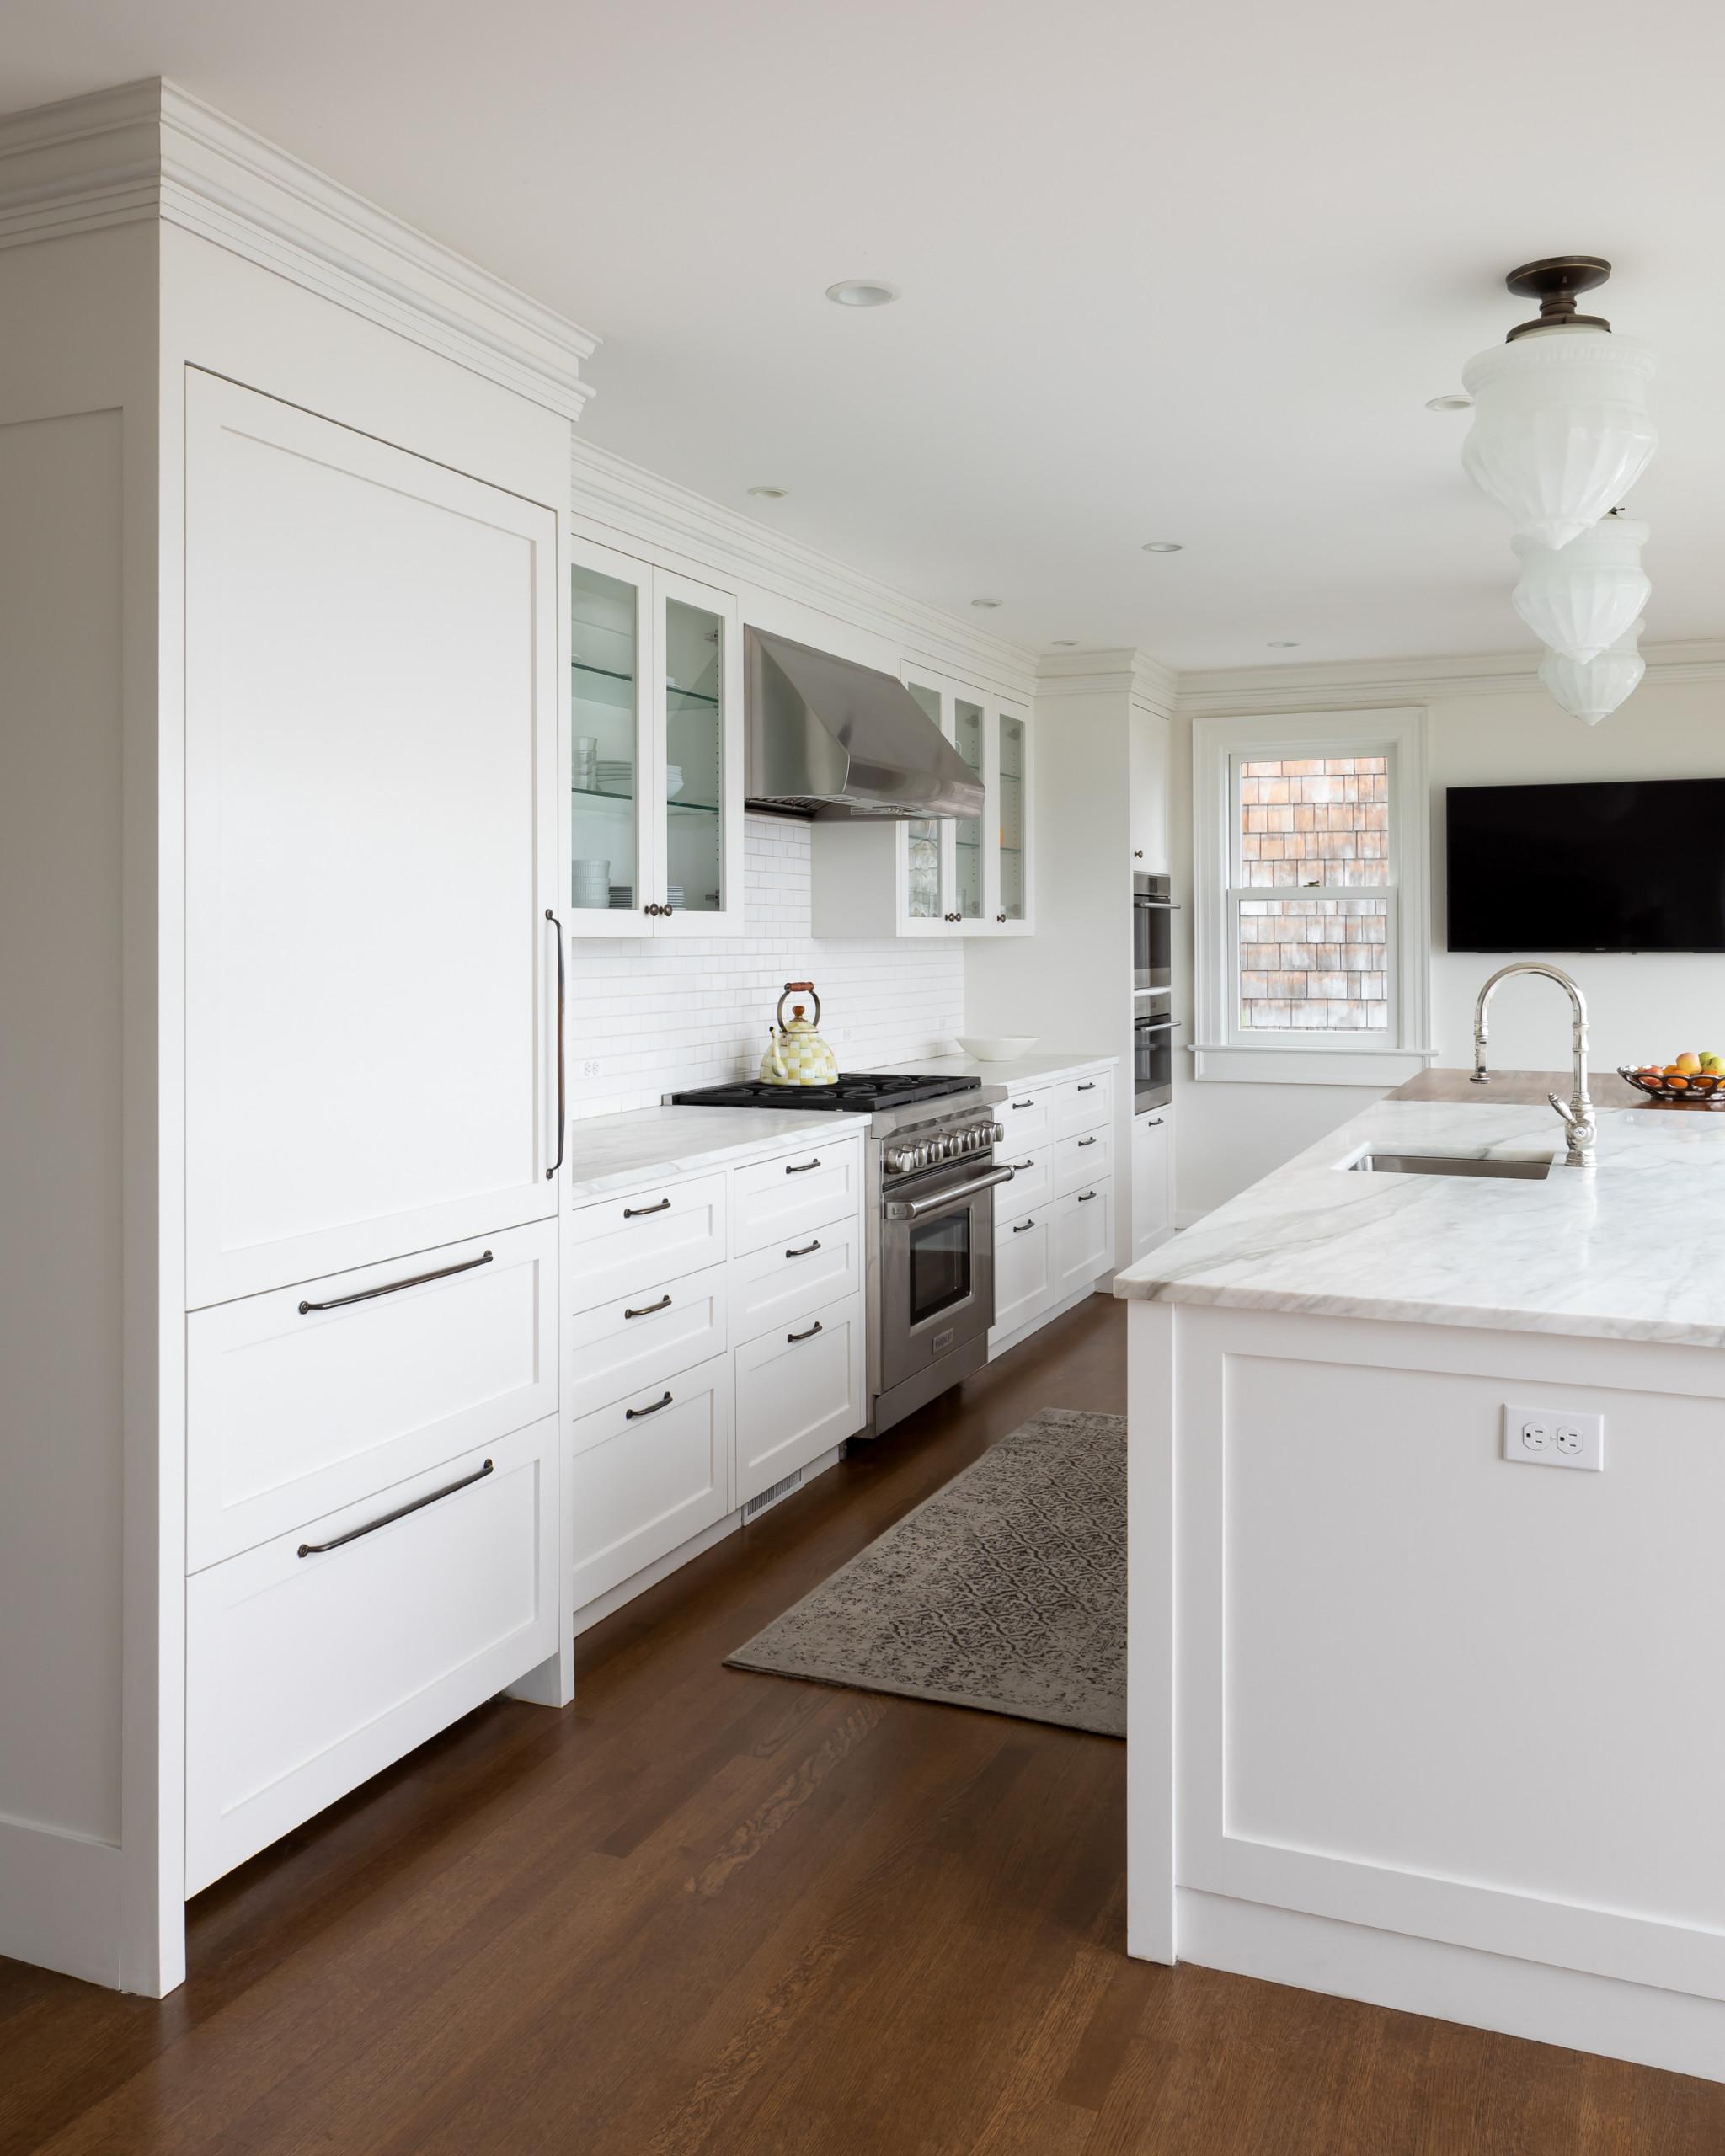 Mount Baker kitchen addition